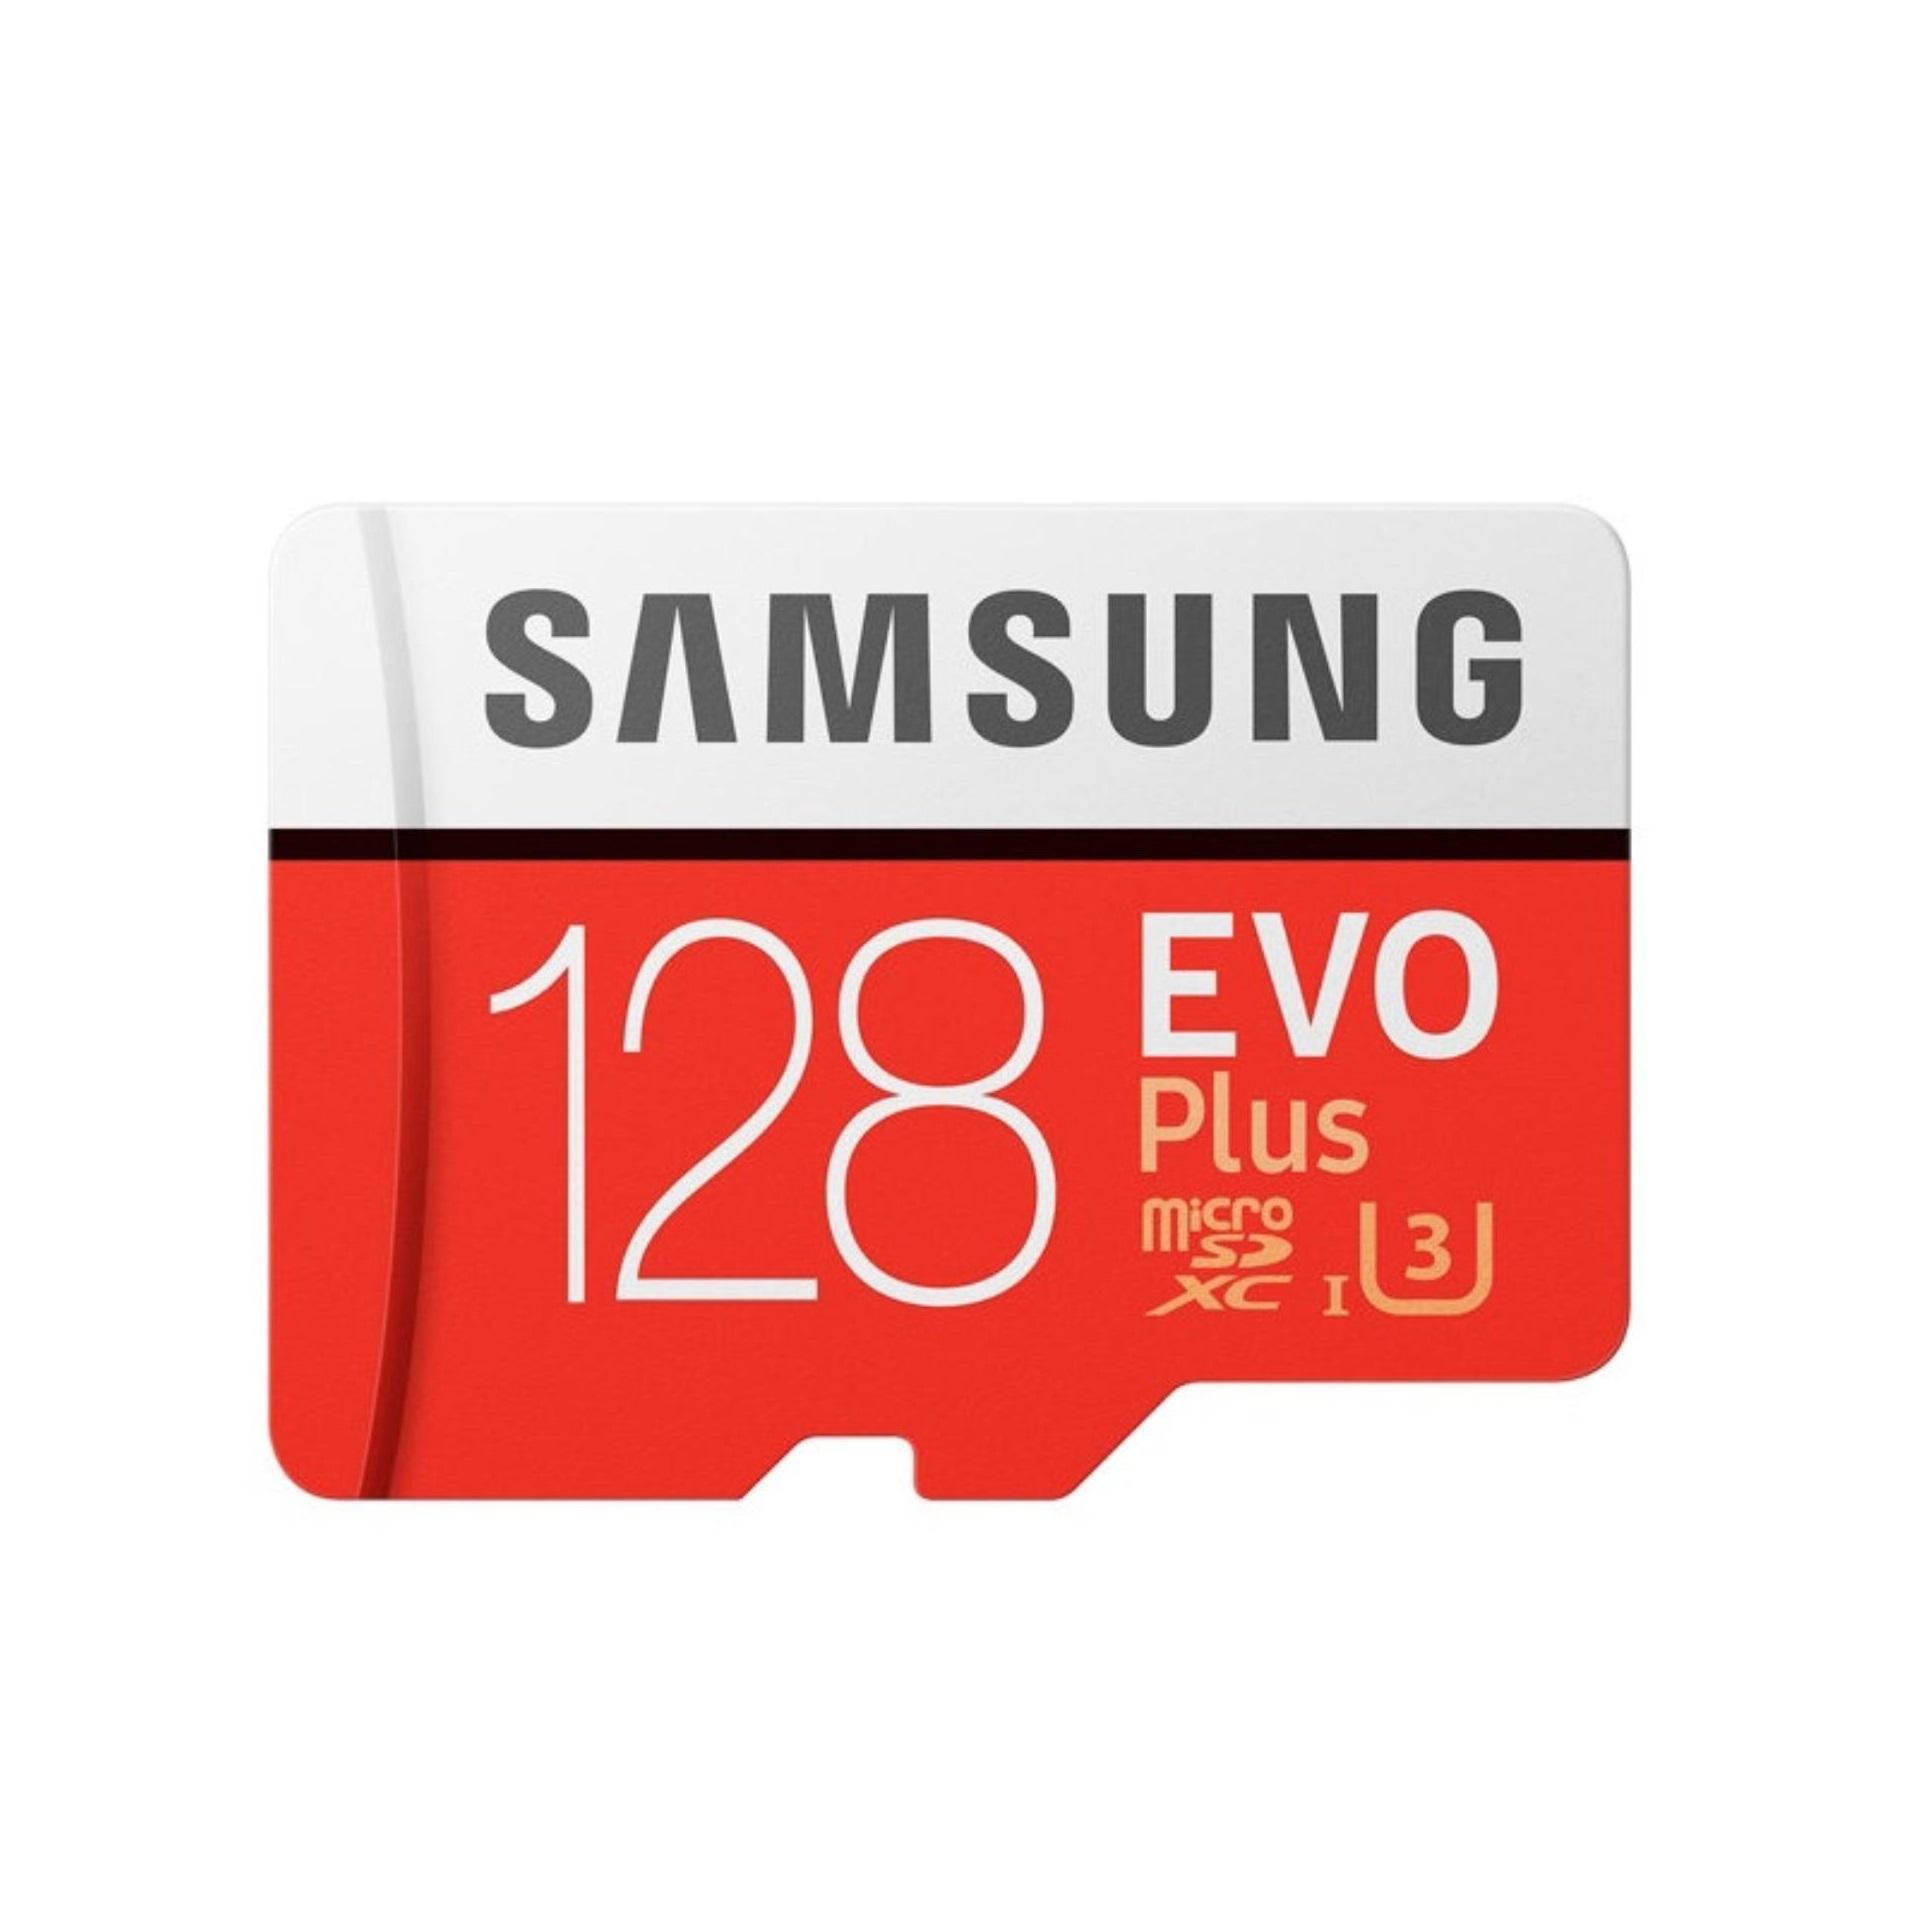 Thẻ nhớ MicroSDXC Samsung Evo Plus 128GB UHS-I U3 4K 100MB/s (Đỏ)